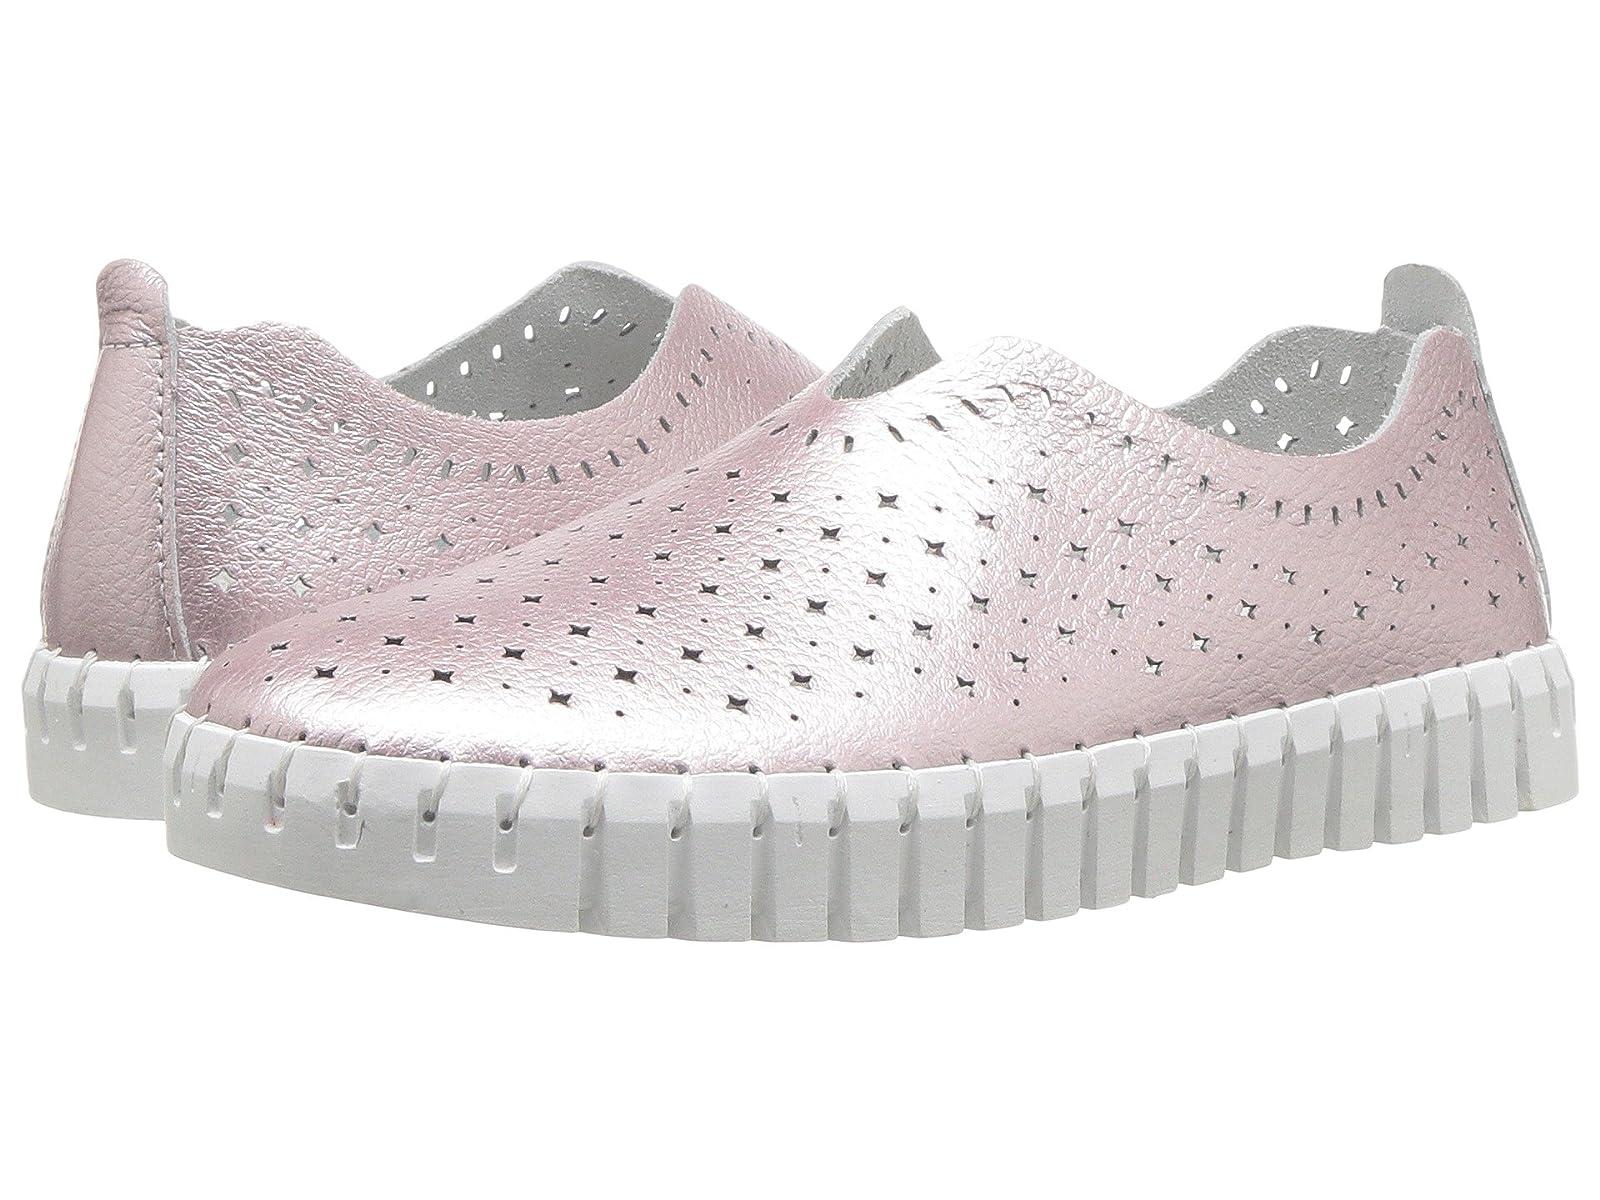 bernie mev. Kids Twk79 (Little Kid/Big Kid)Atmospheric grades have affordable shoes